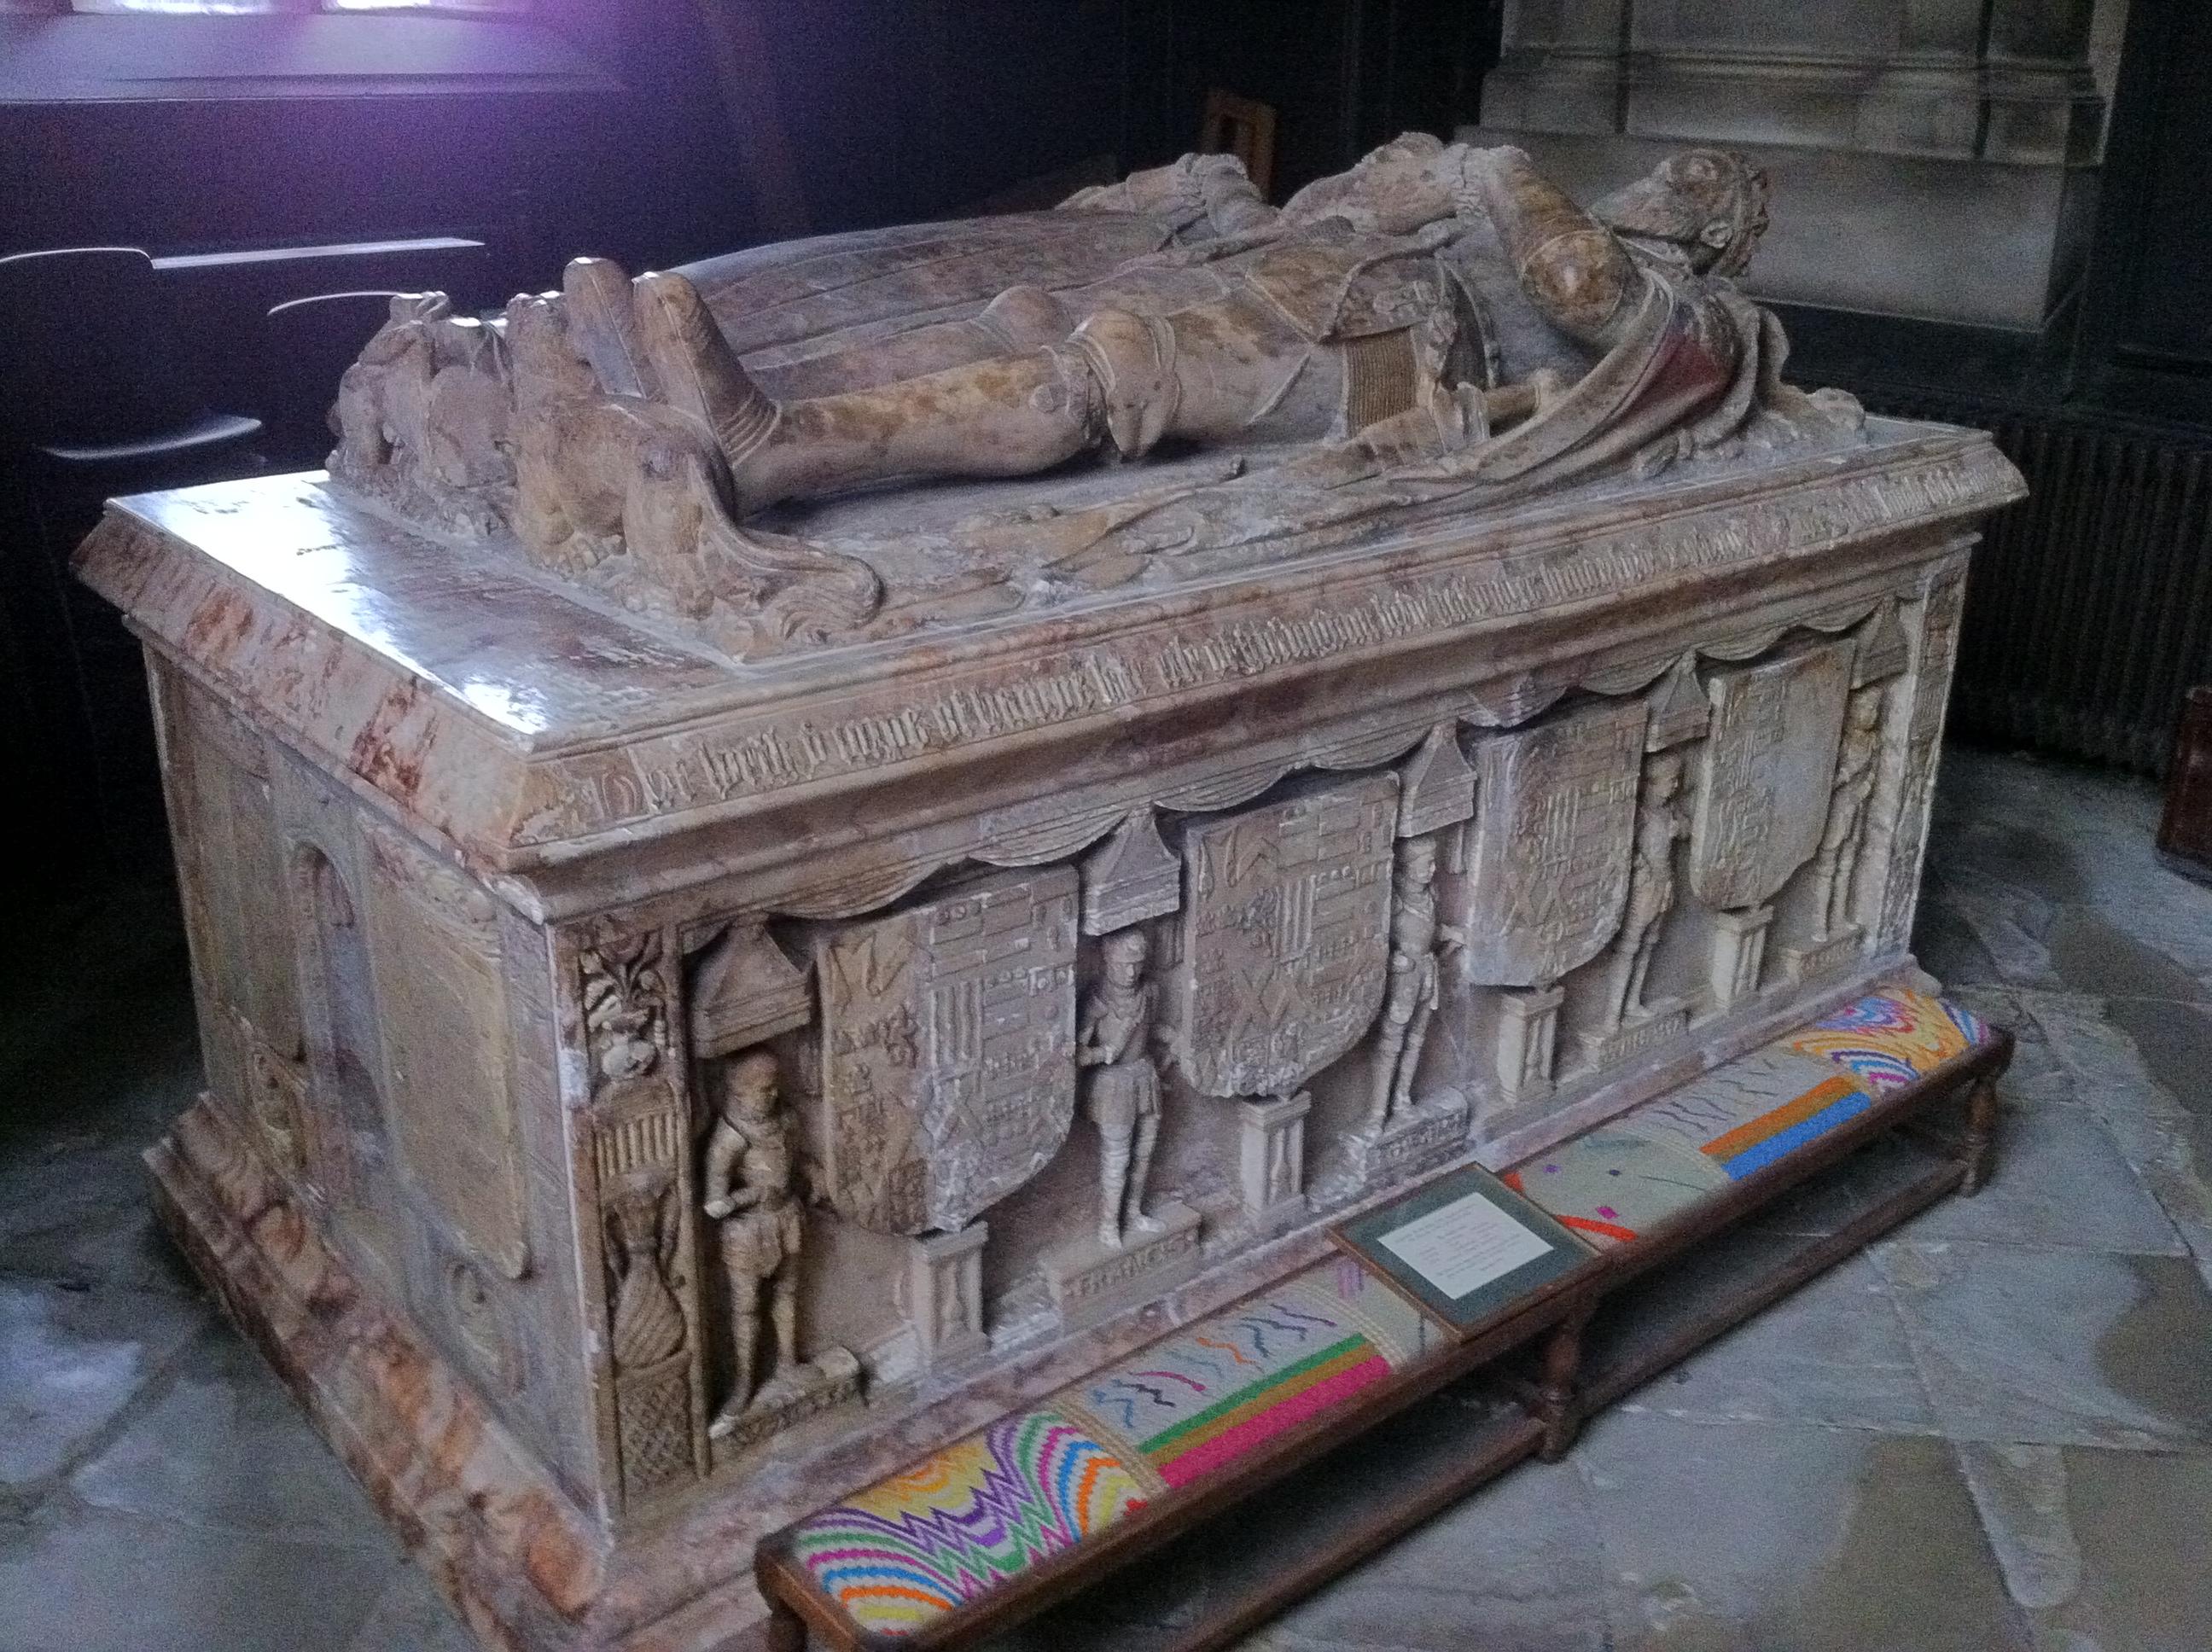 Francis Hastings, 2nd Earl of Huntingdon